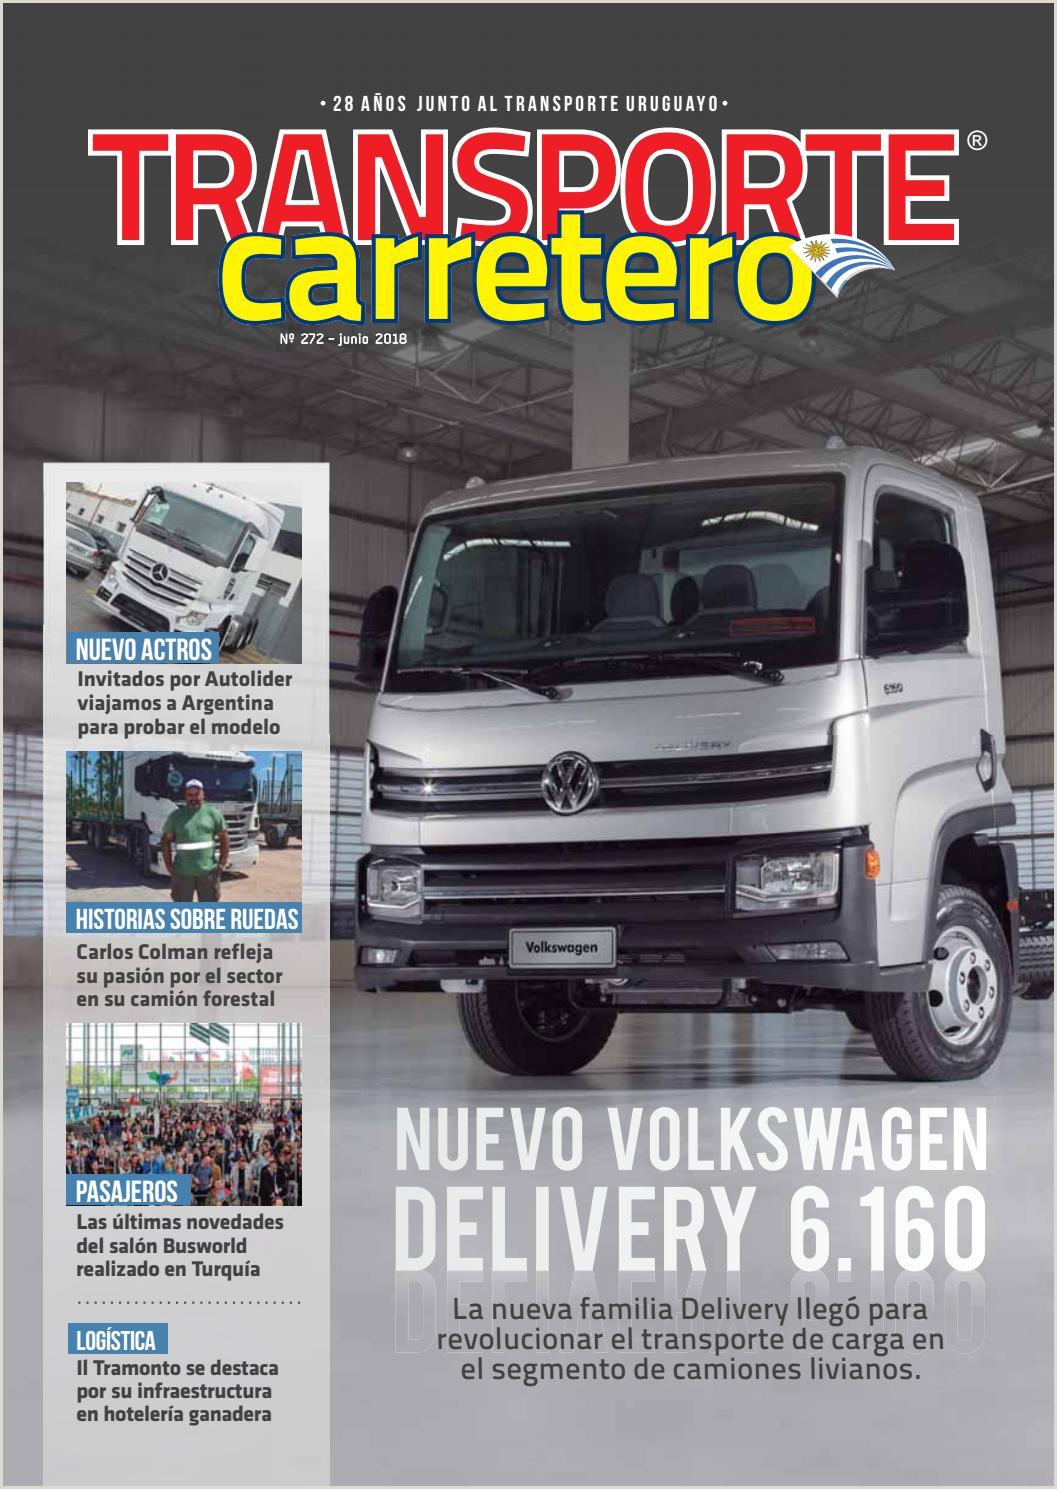 Transporte Carretero Nº 272 Junio 2018 by Dise±o